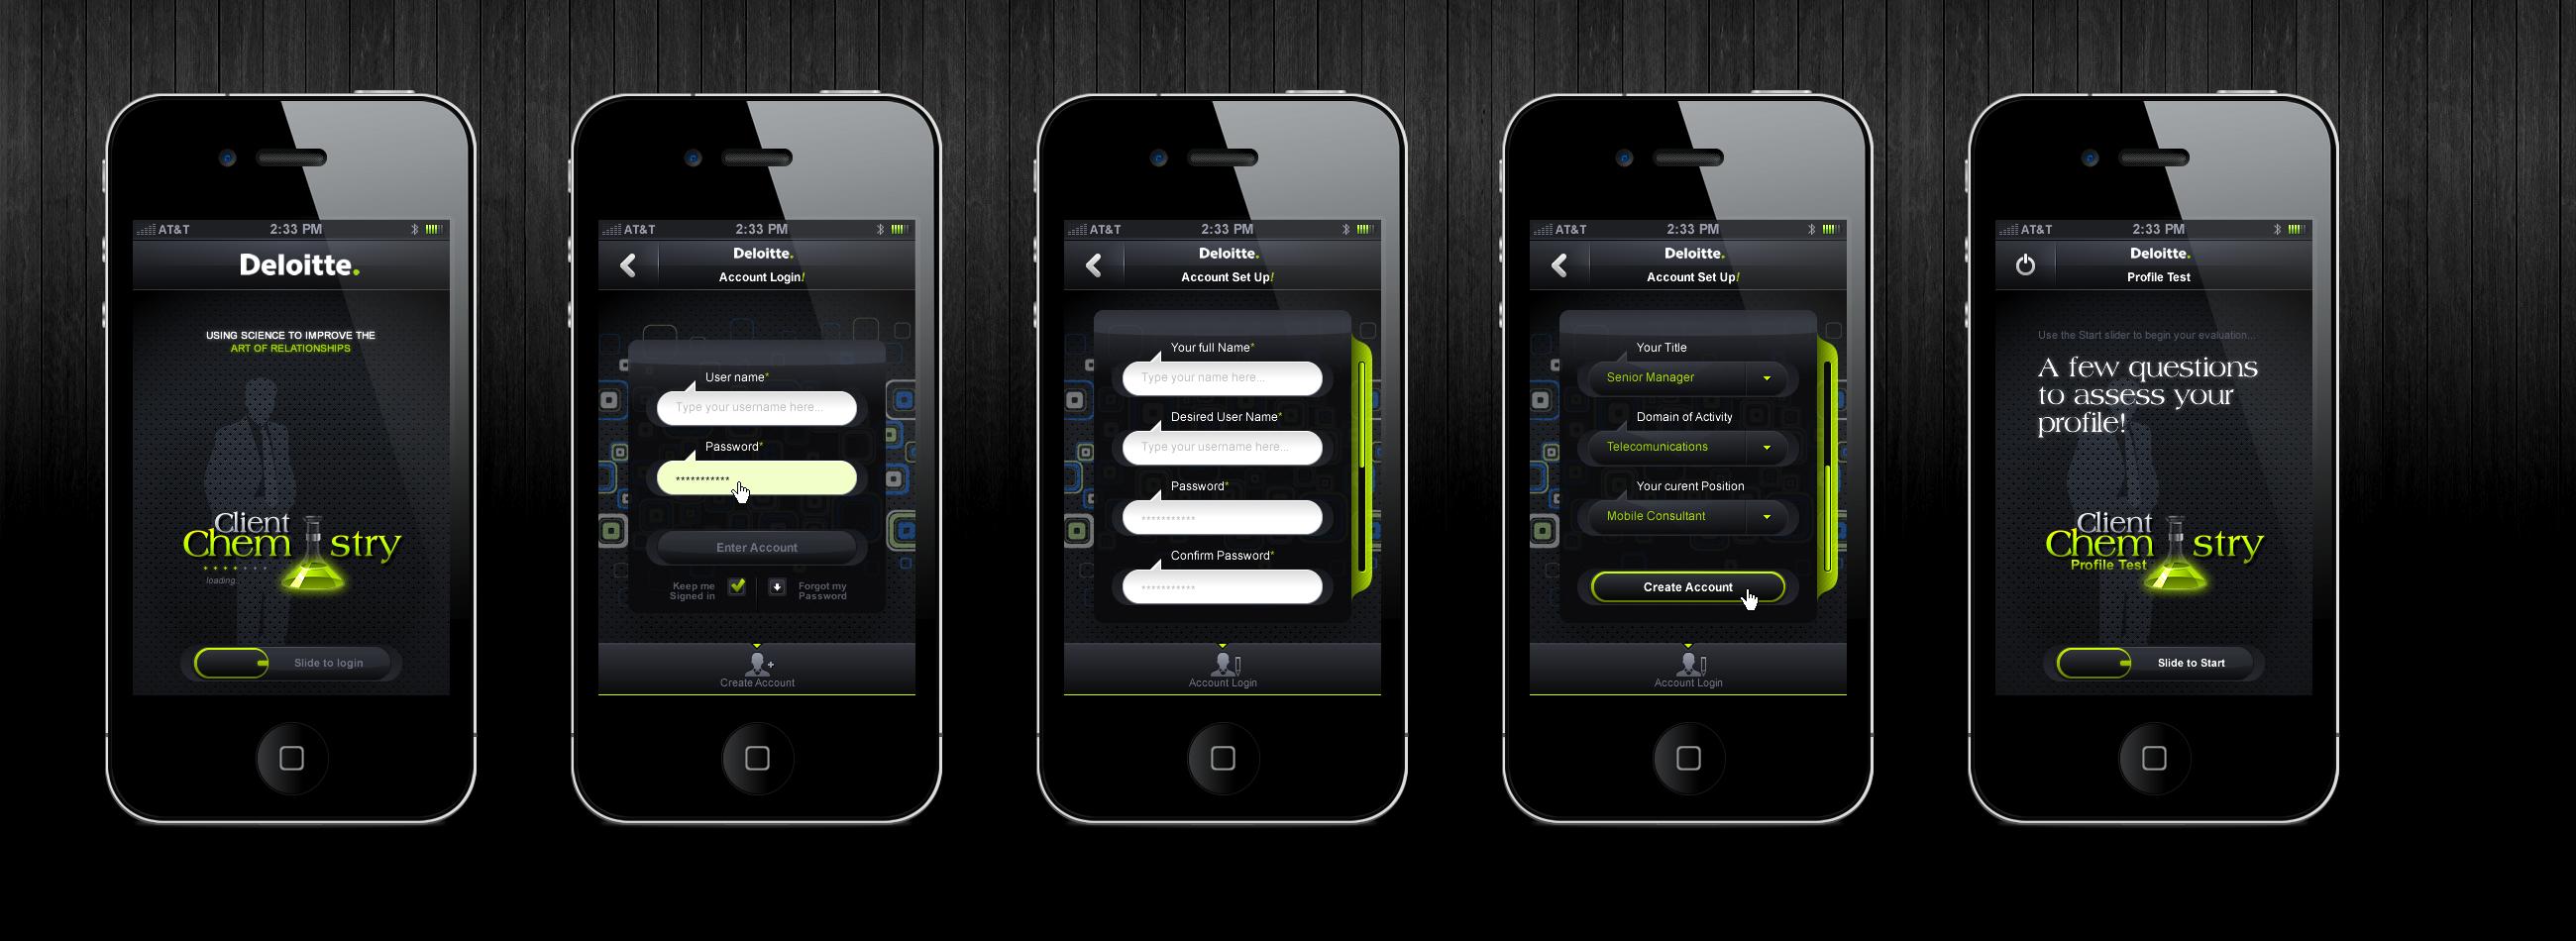 Iphone Application Design By Sonyaxel On Deviantart